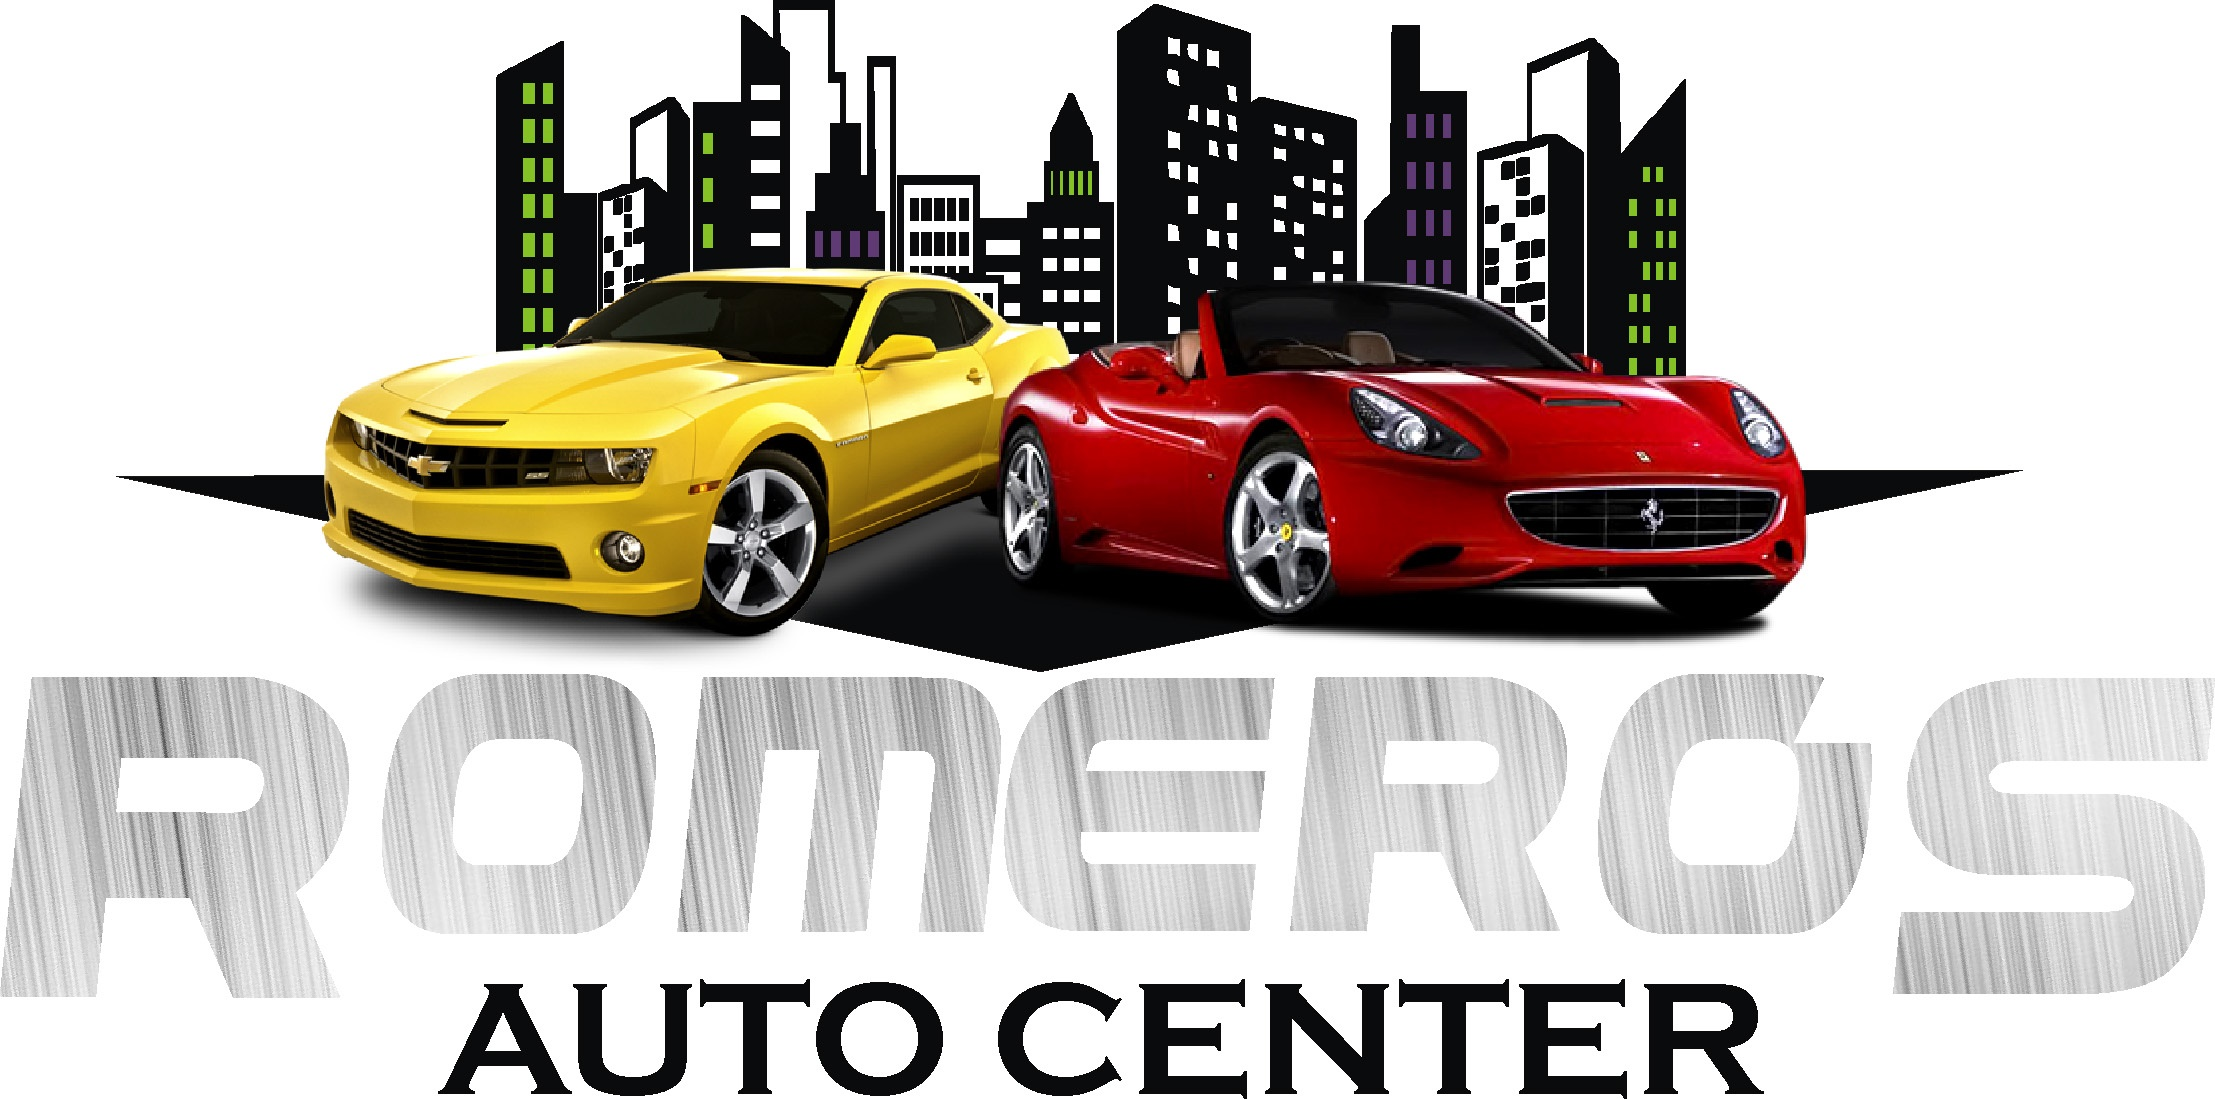 Romeros Auto Center Vehicle Specials